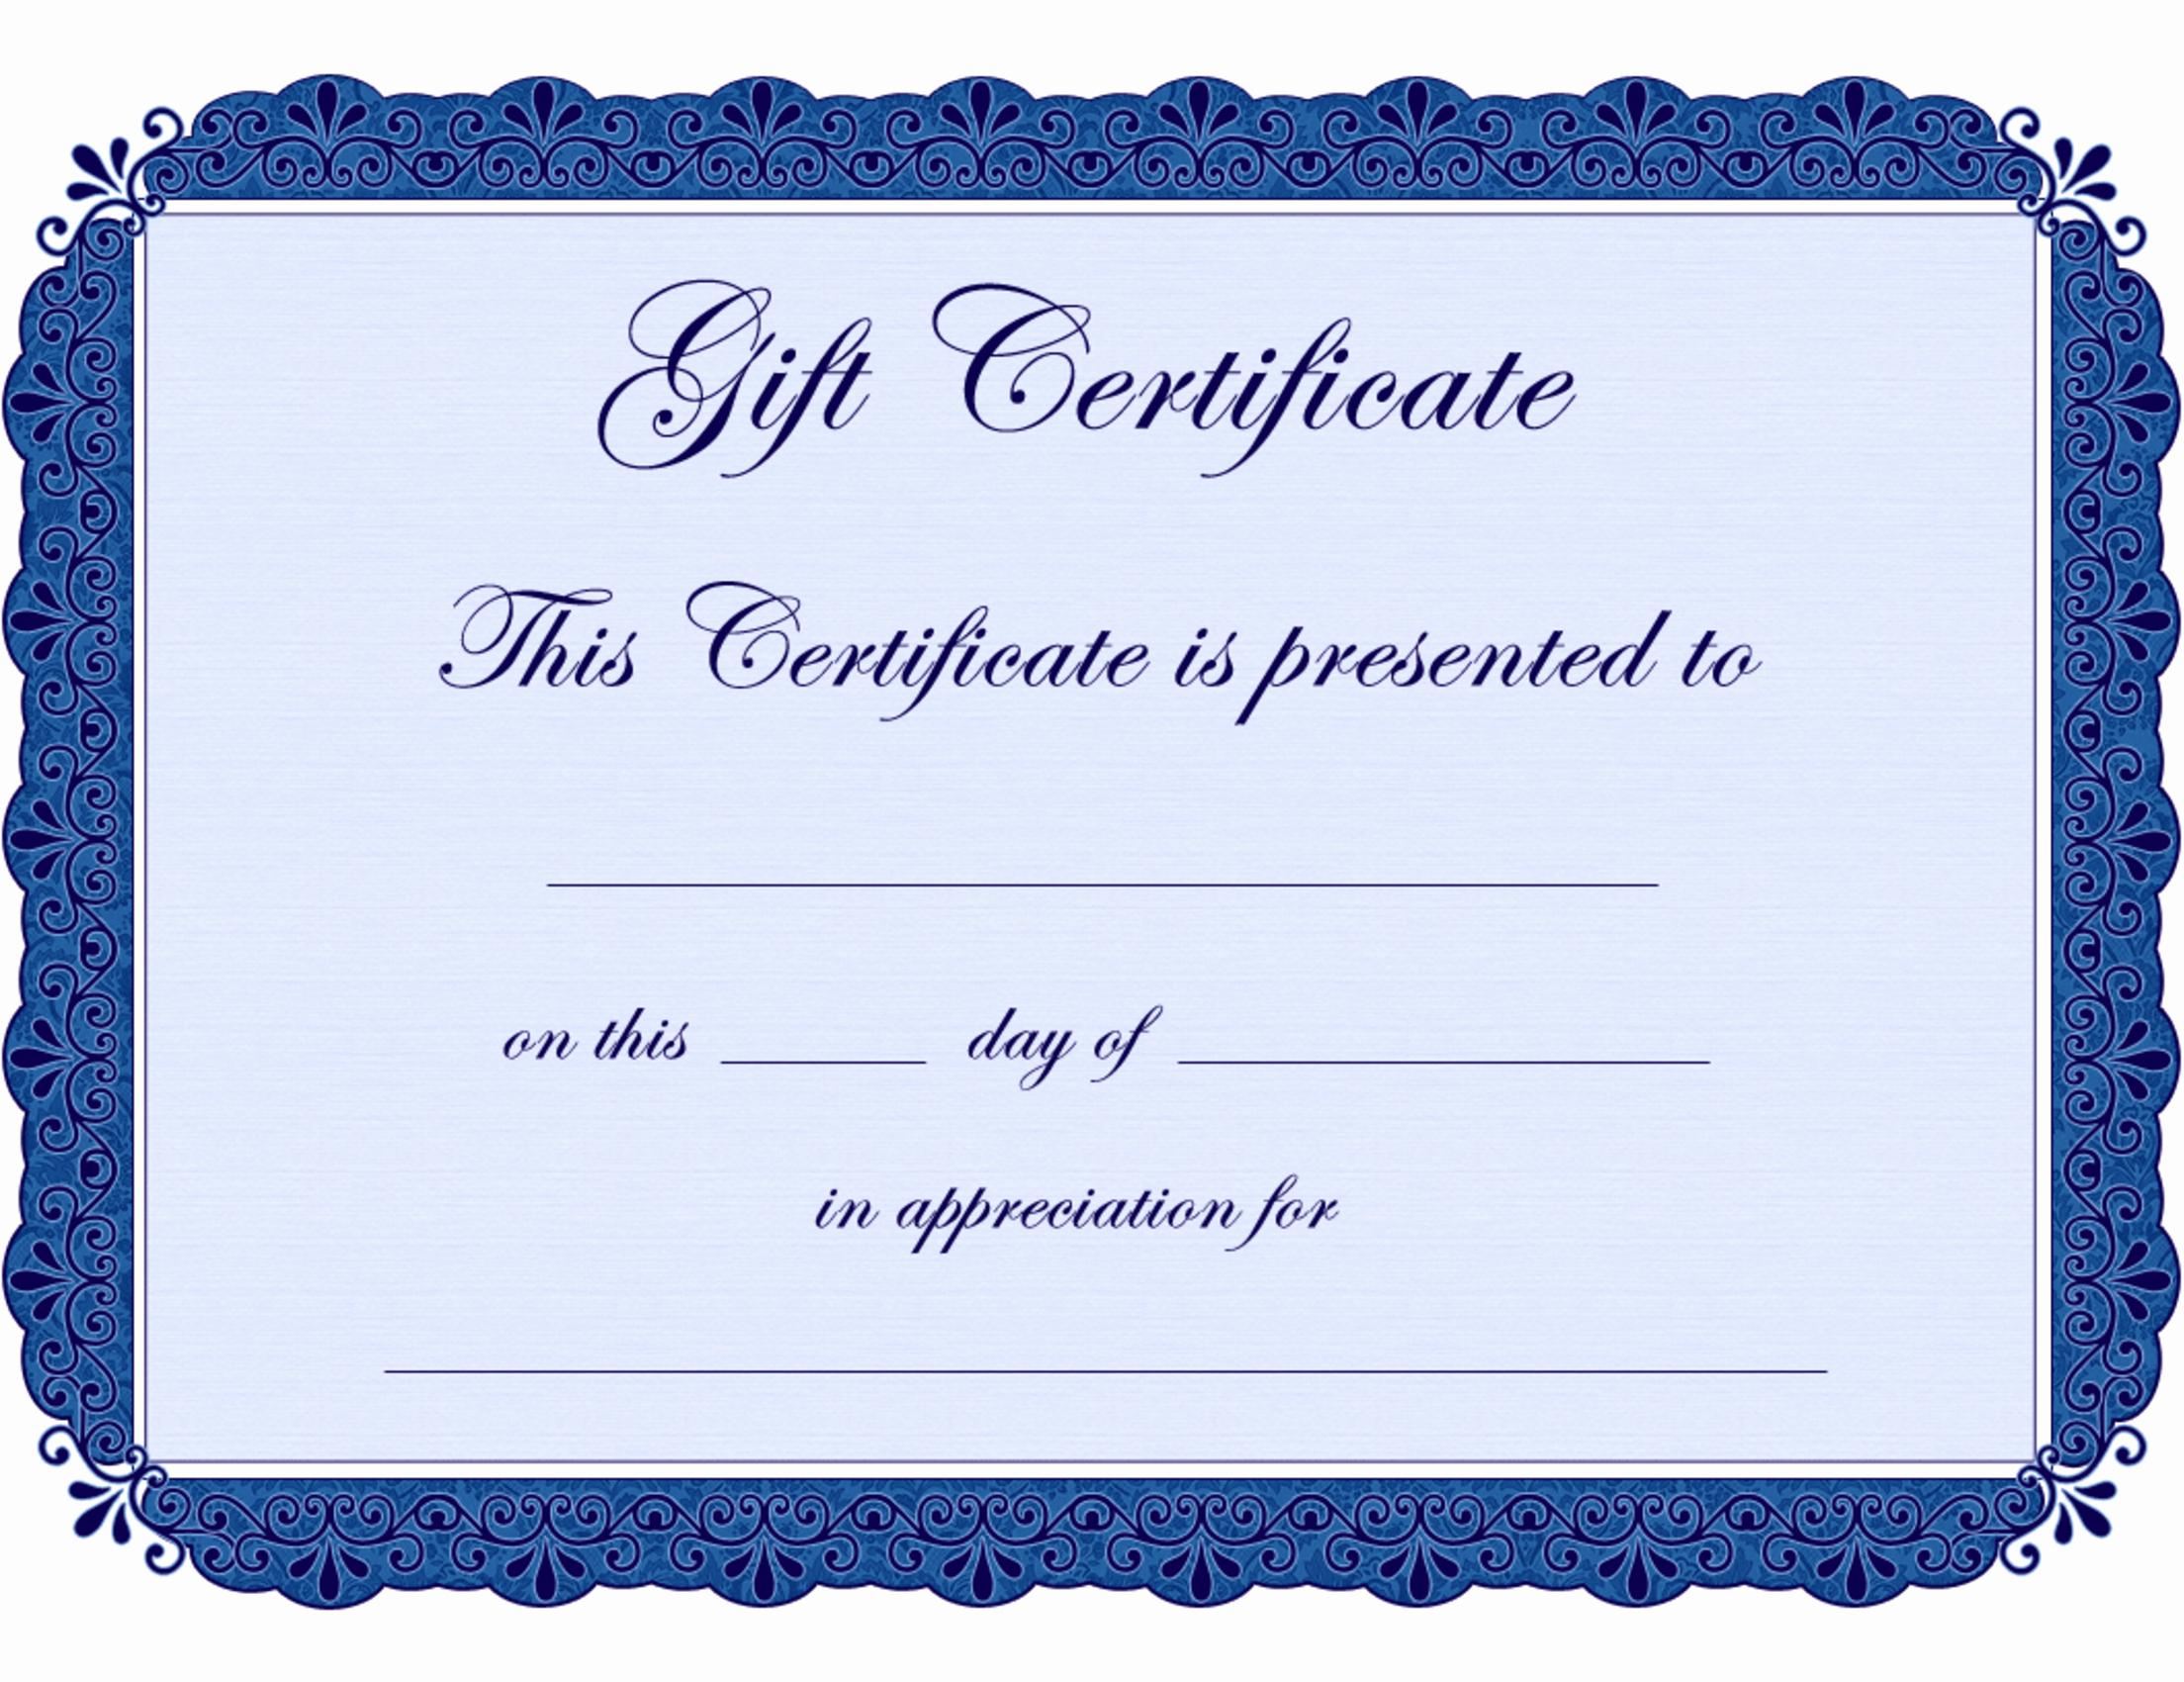 Generic Gift Certificates Print Free Elegant Printable Gift Certificates Clipart Clipart Suggest